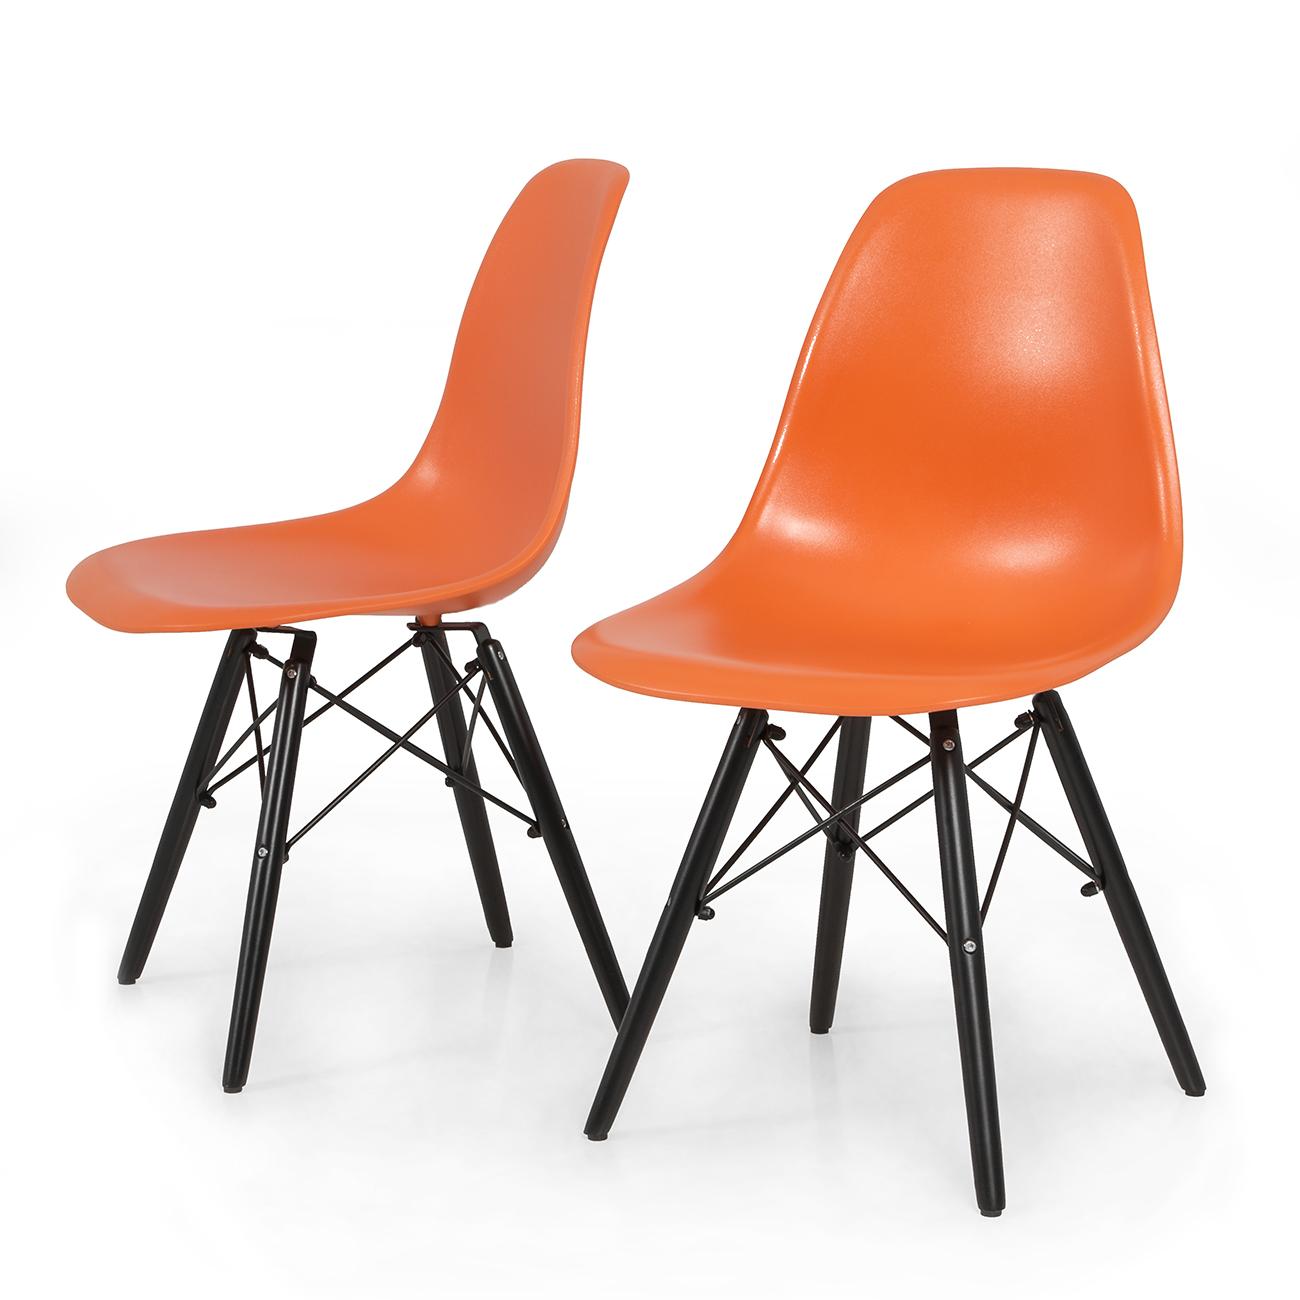 2x dsw molded abs plastic side chair eiffel dowel wood leg for Eames dowel leg side chair